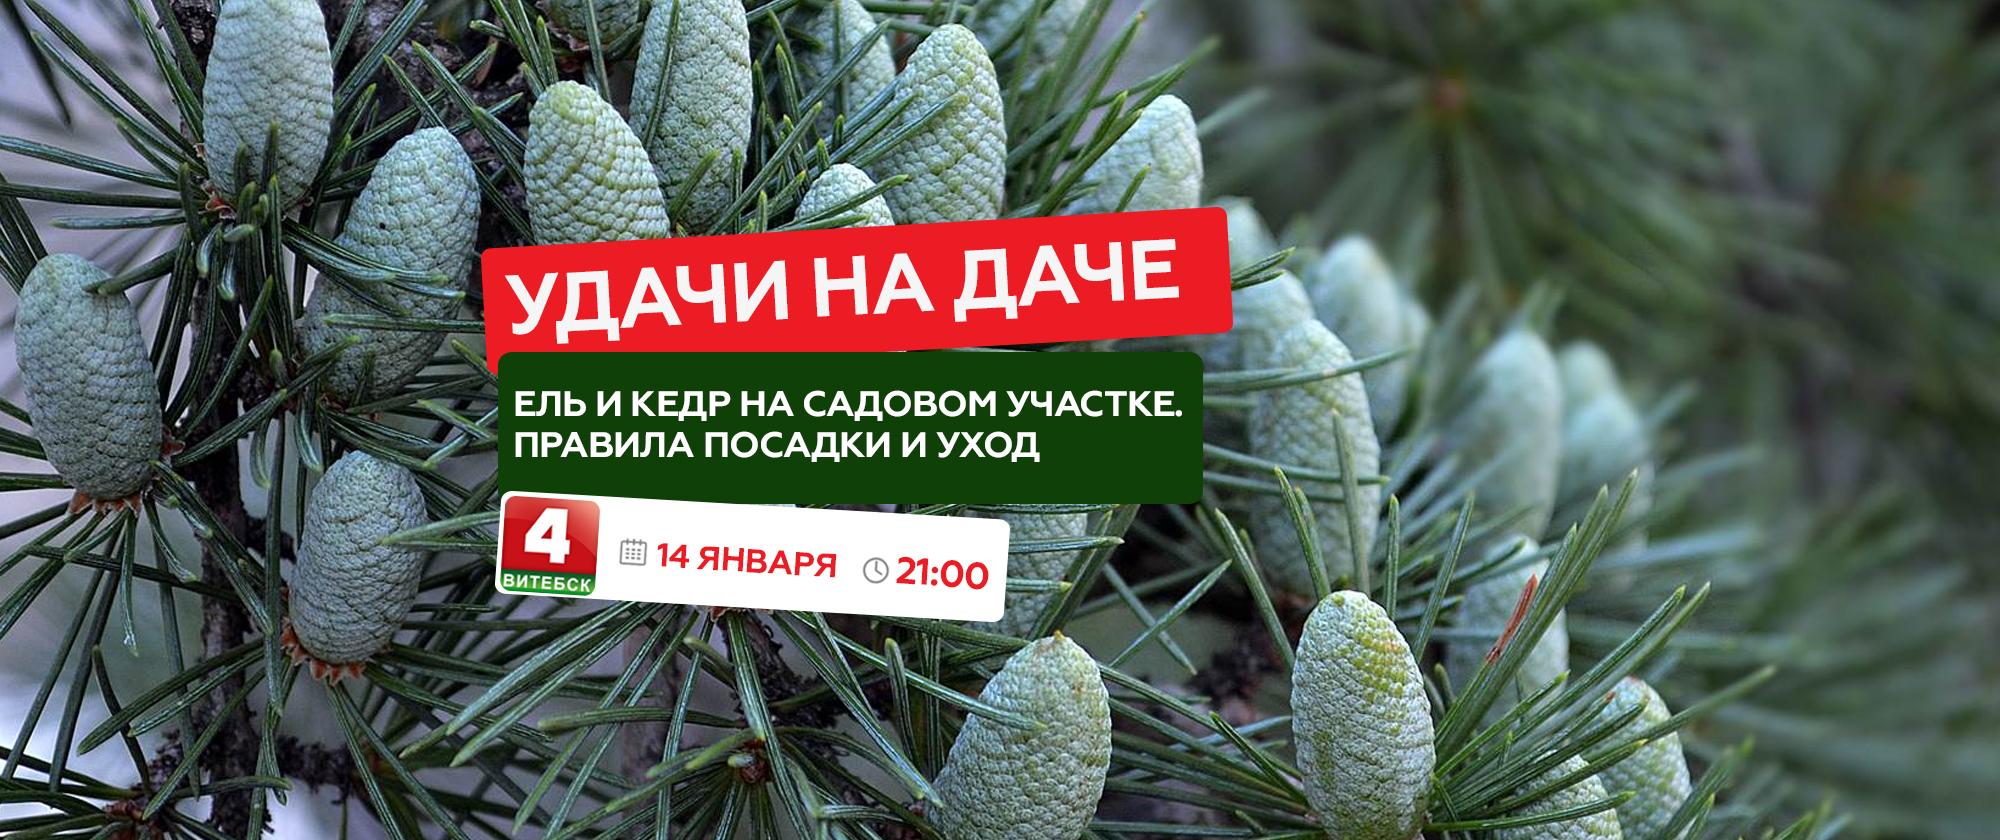 udachi na dache 14 janvarja - Удачи на даче-14-января